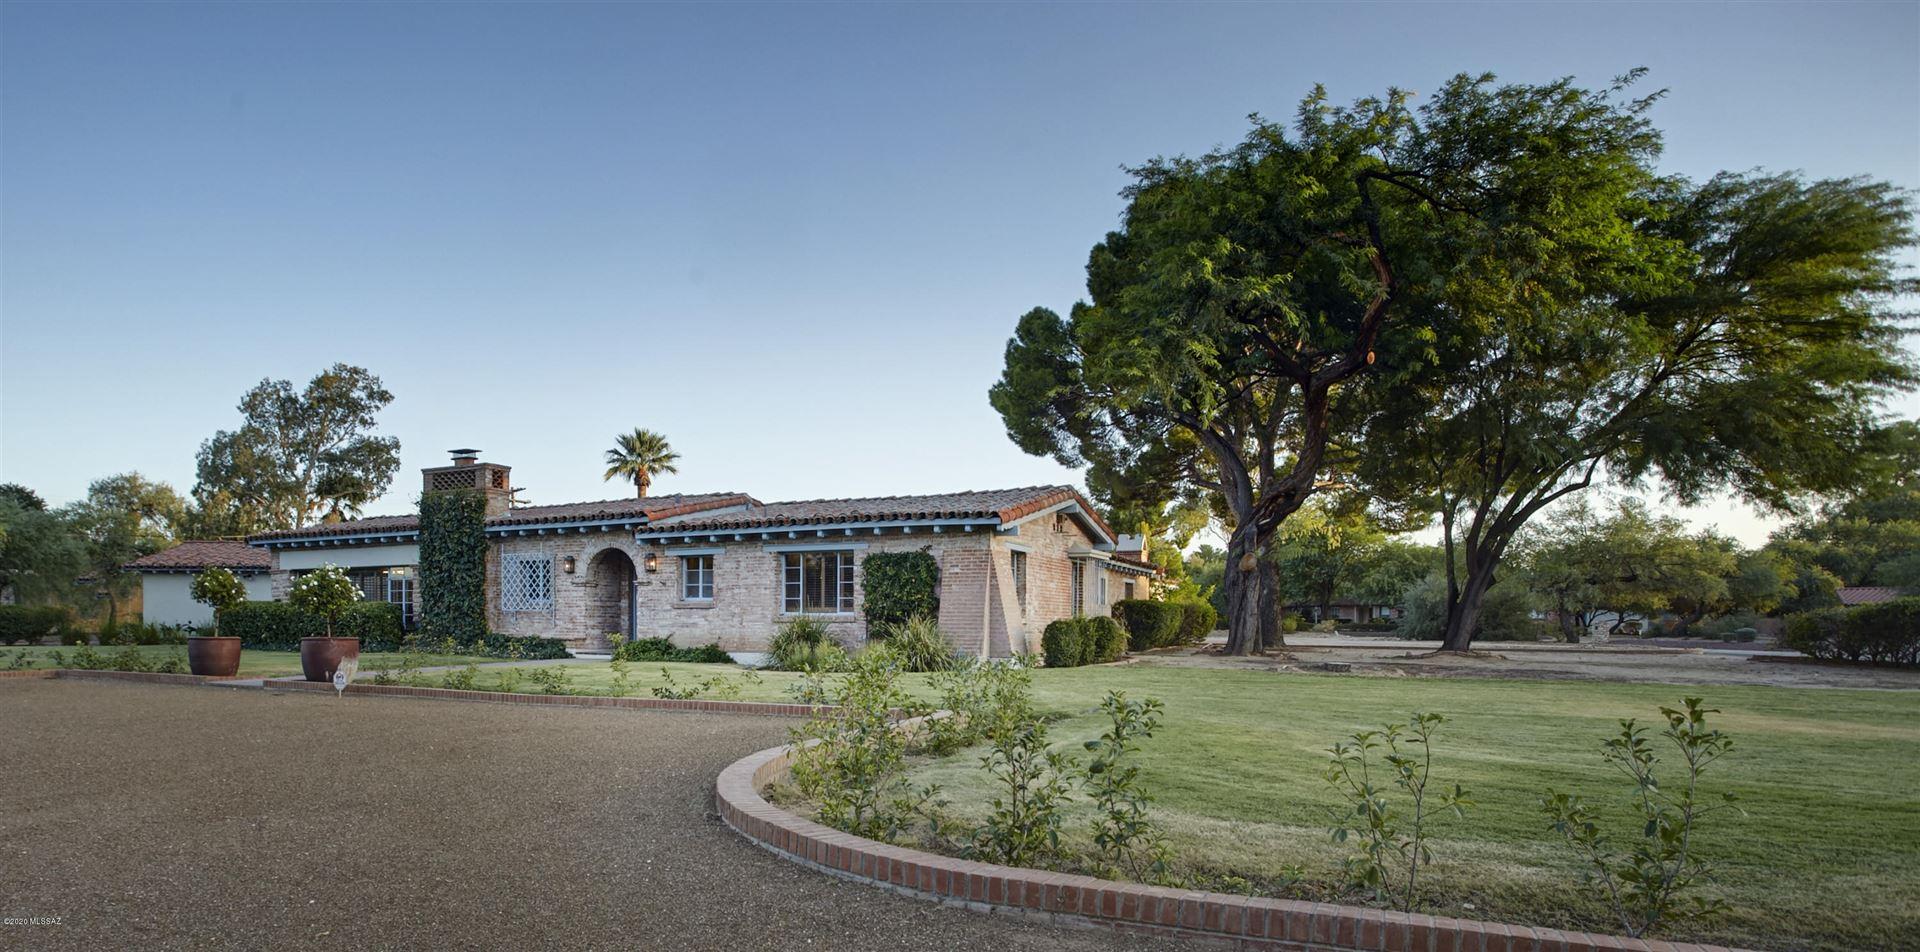 6406 E Miramar Drive, Tucson, AZ 85715 - #: 22024818